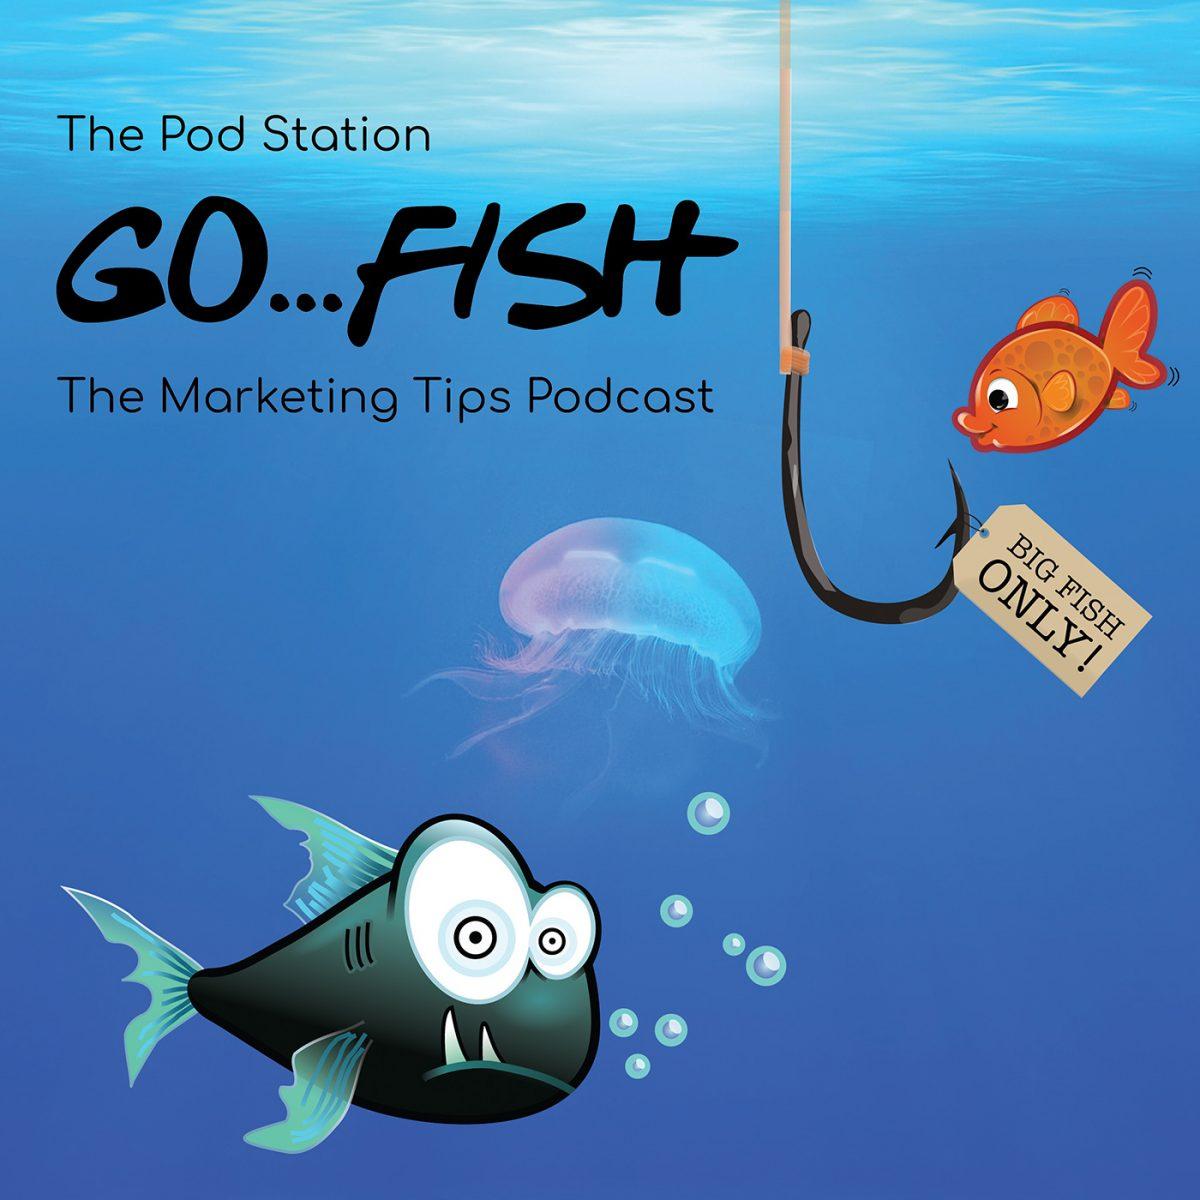 go....fish